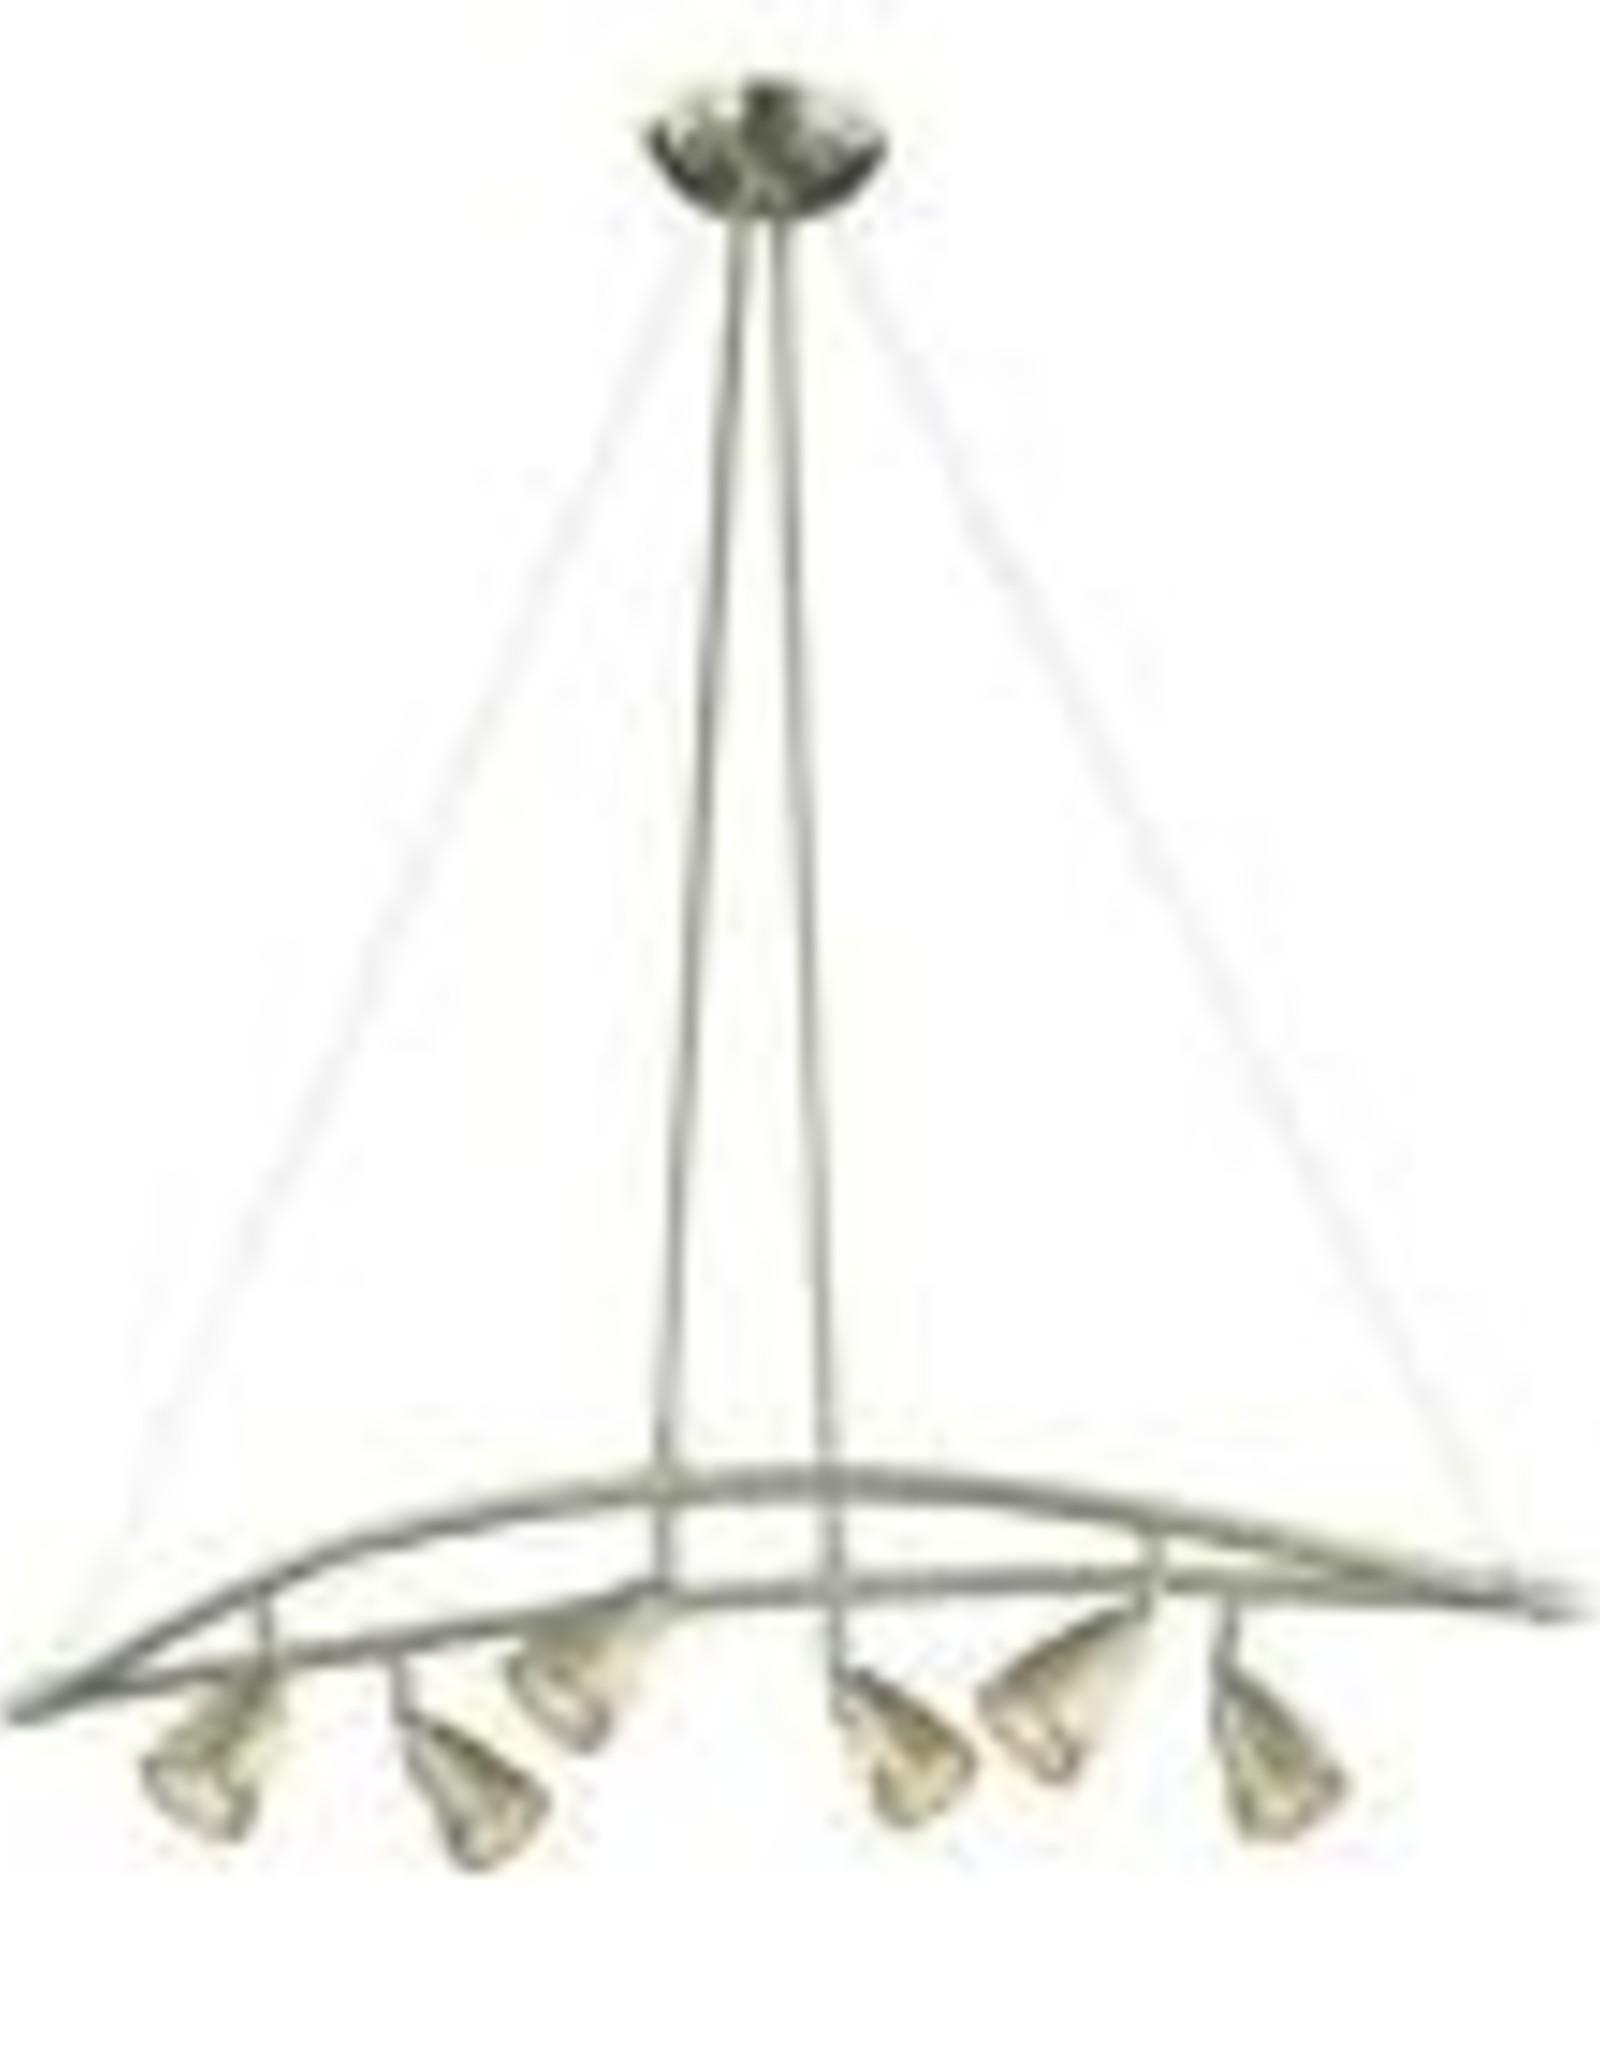 Hampton Bay 6-Light Brushed Steel Chandelier with Multi-Directional Spotlights